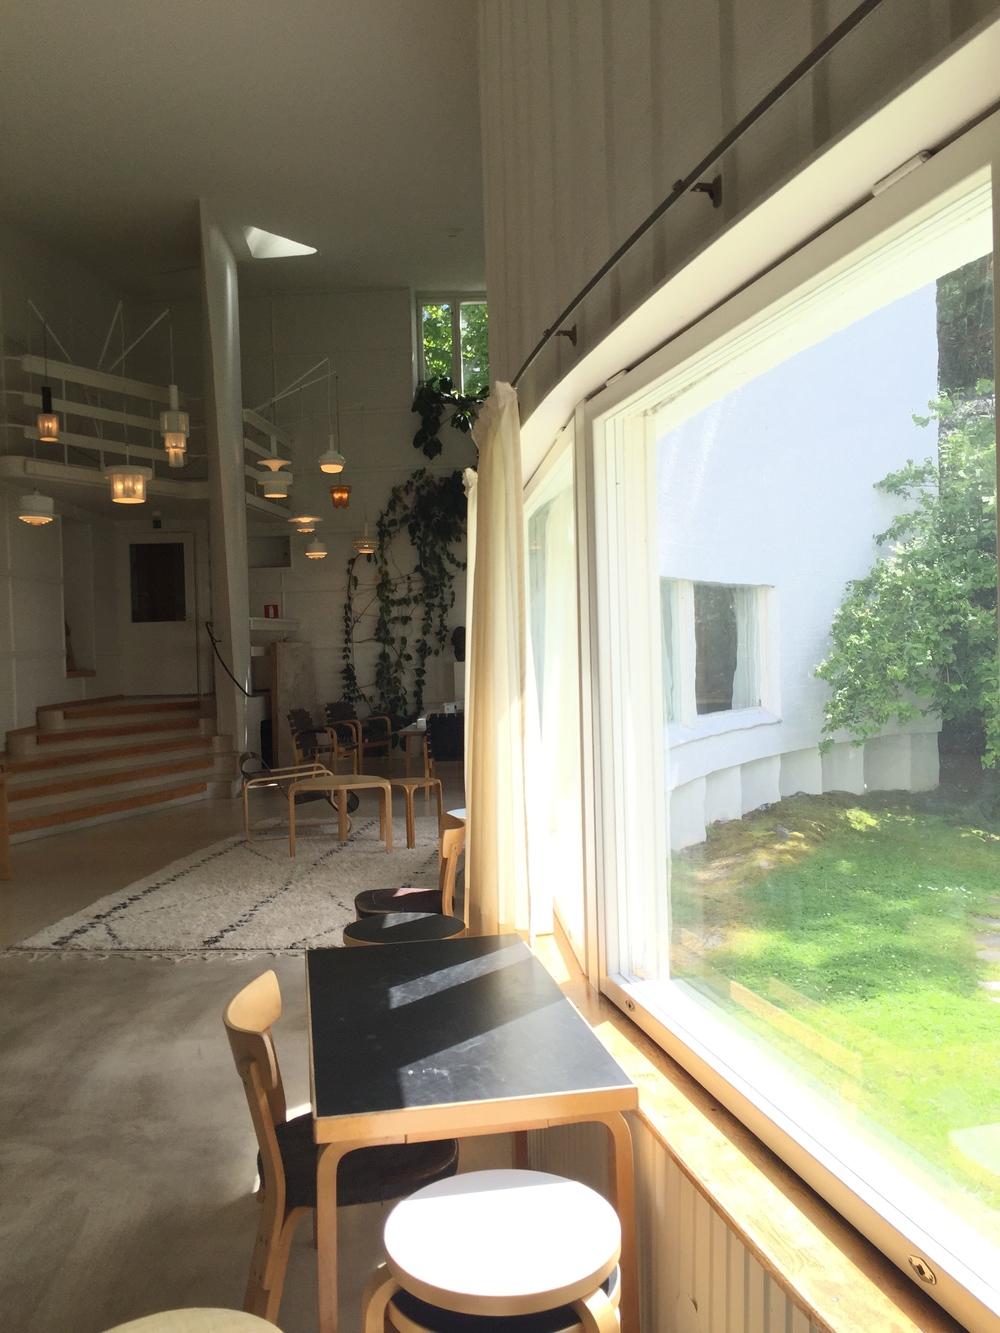 Studio Aalto / 11 July 2015